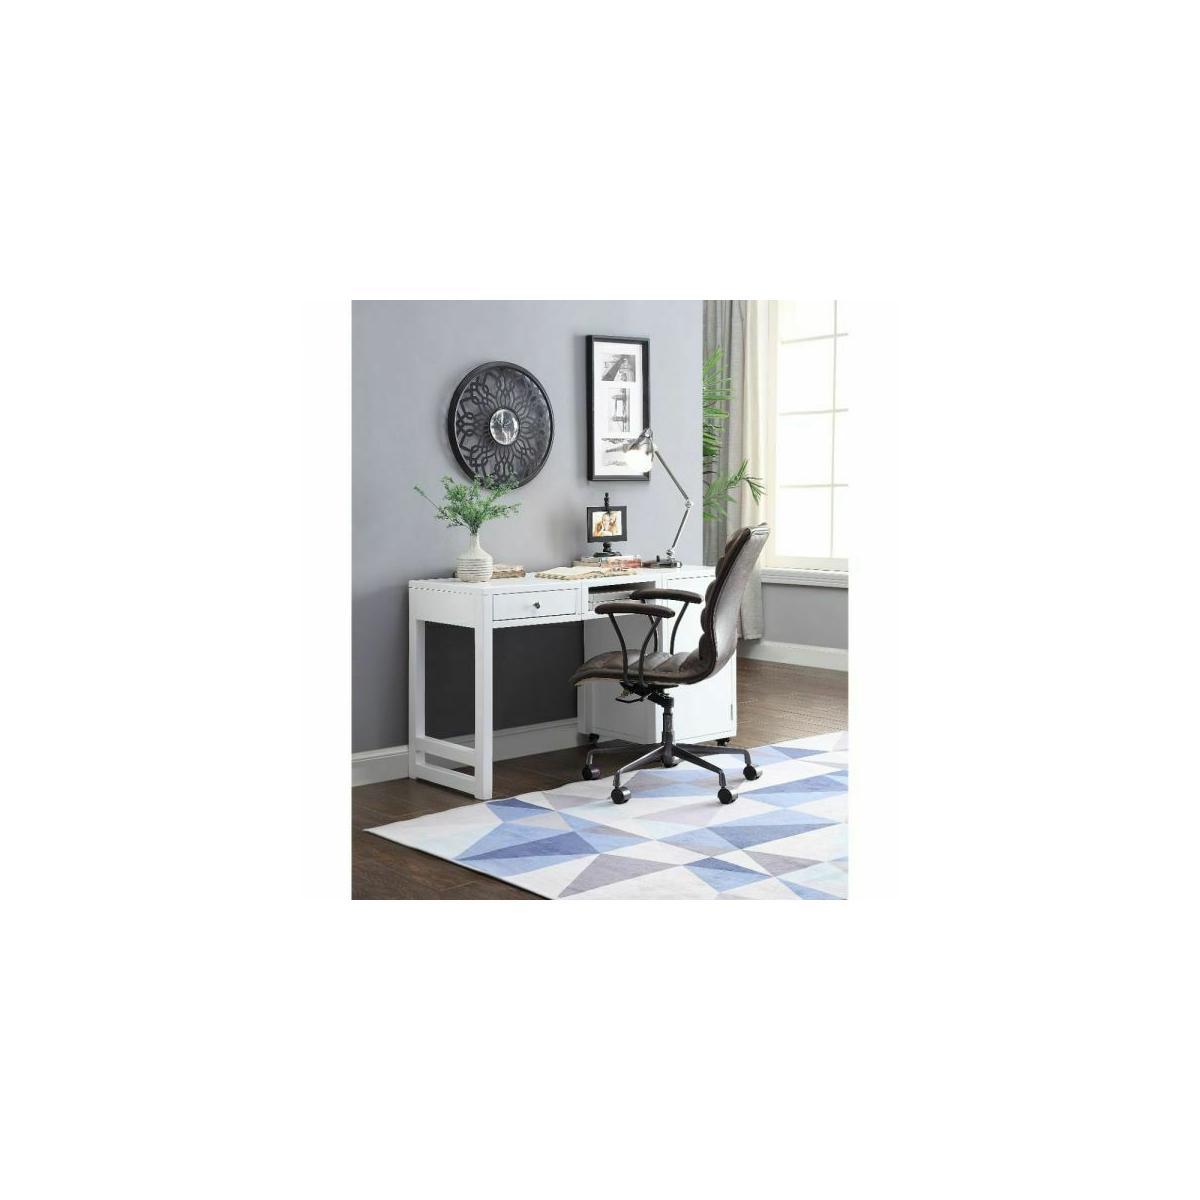 ACME Kaniel Desk (Convertible) - 92835 - White